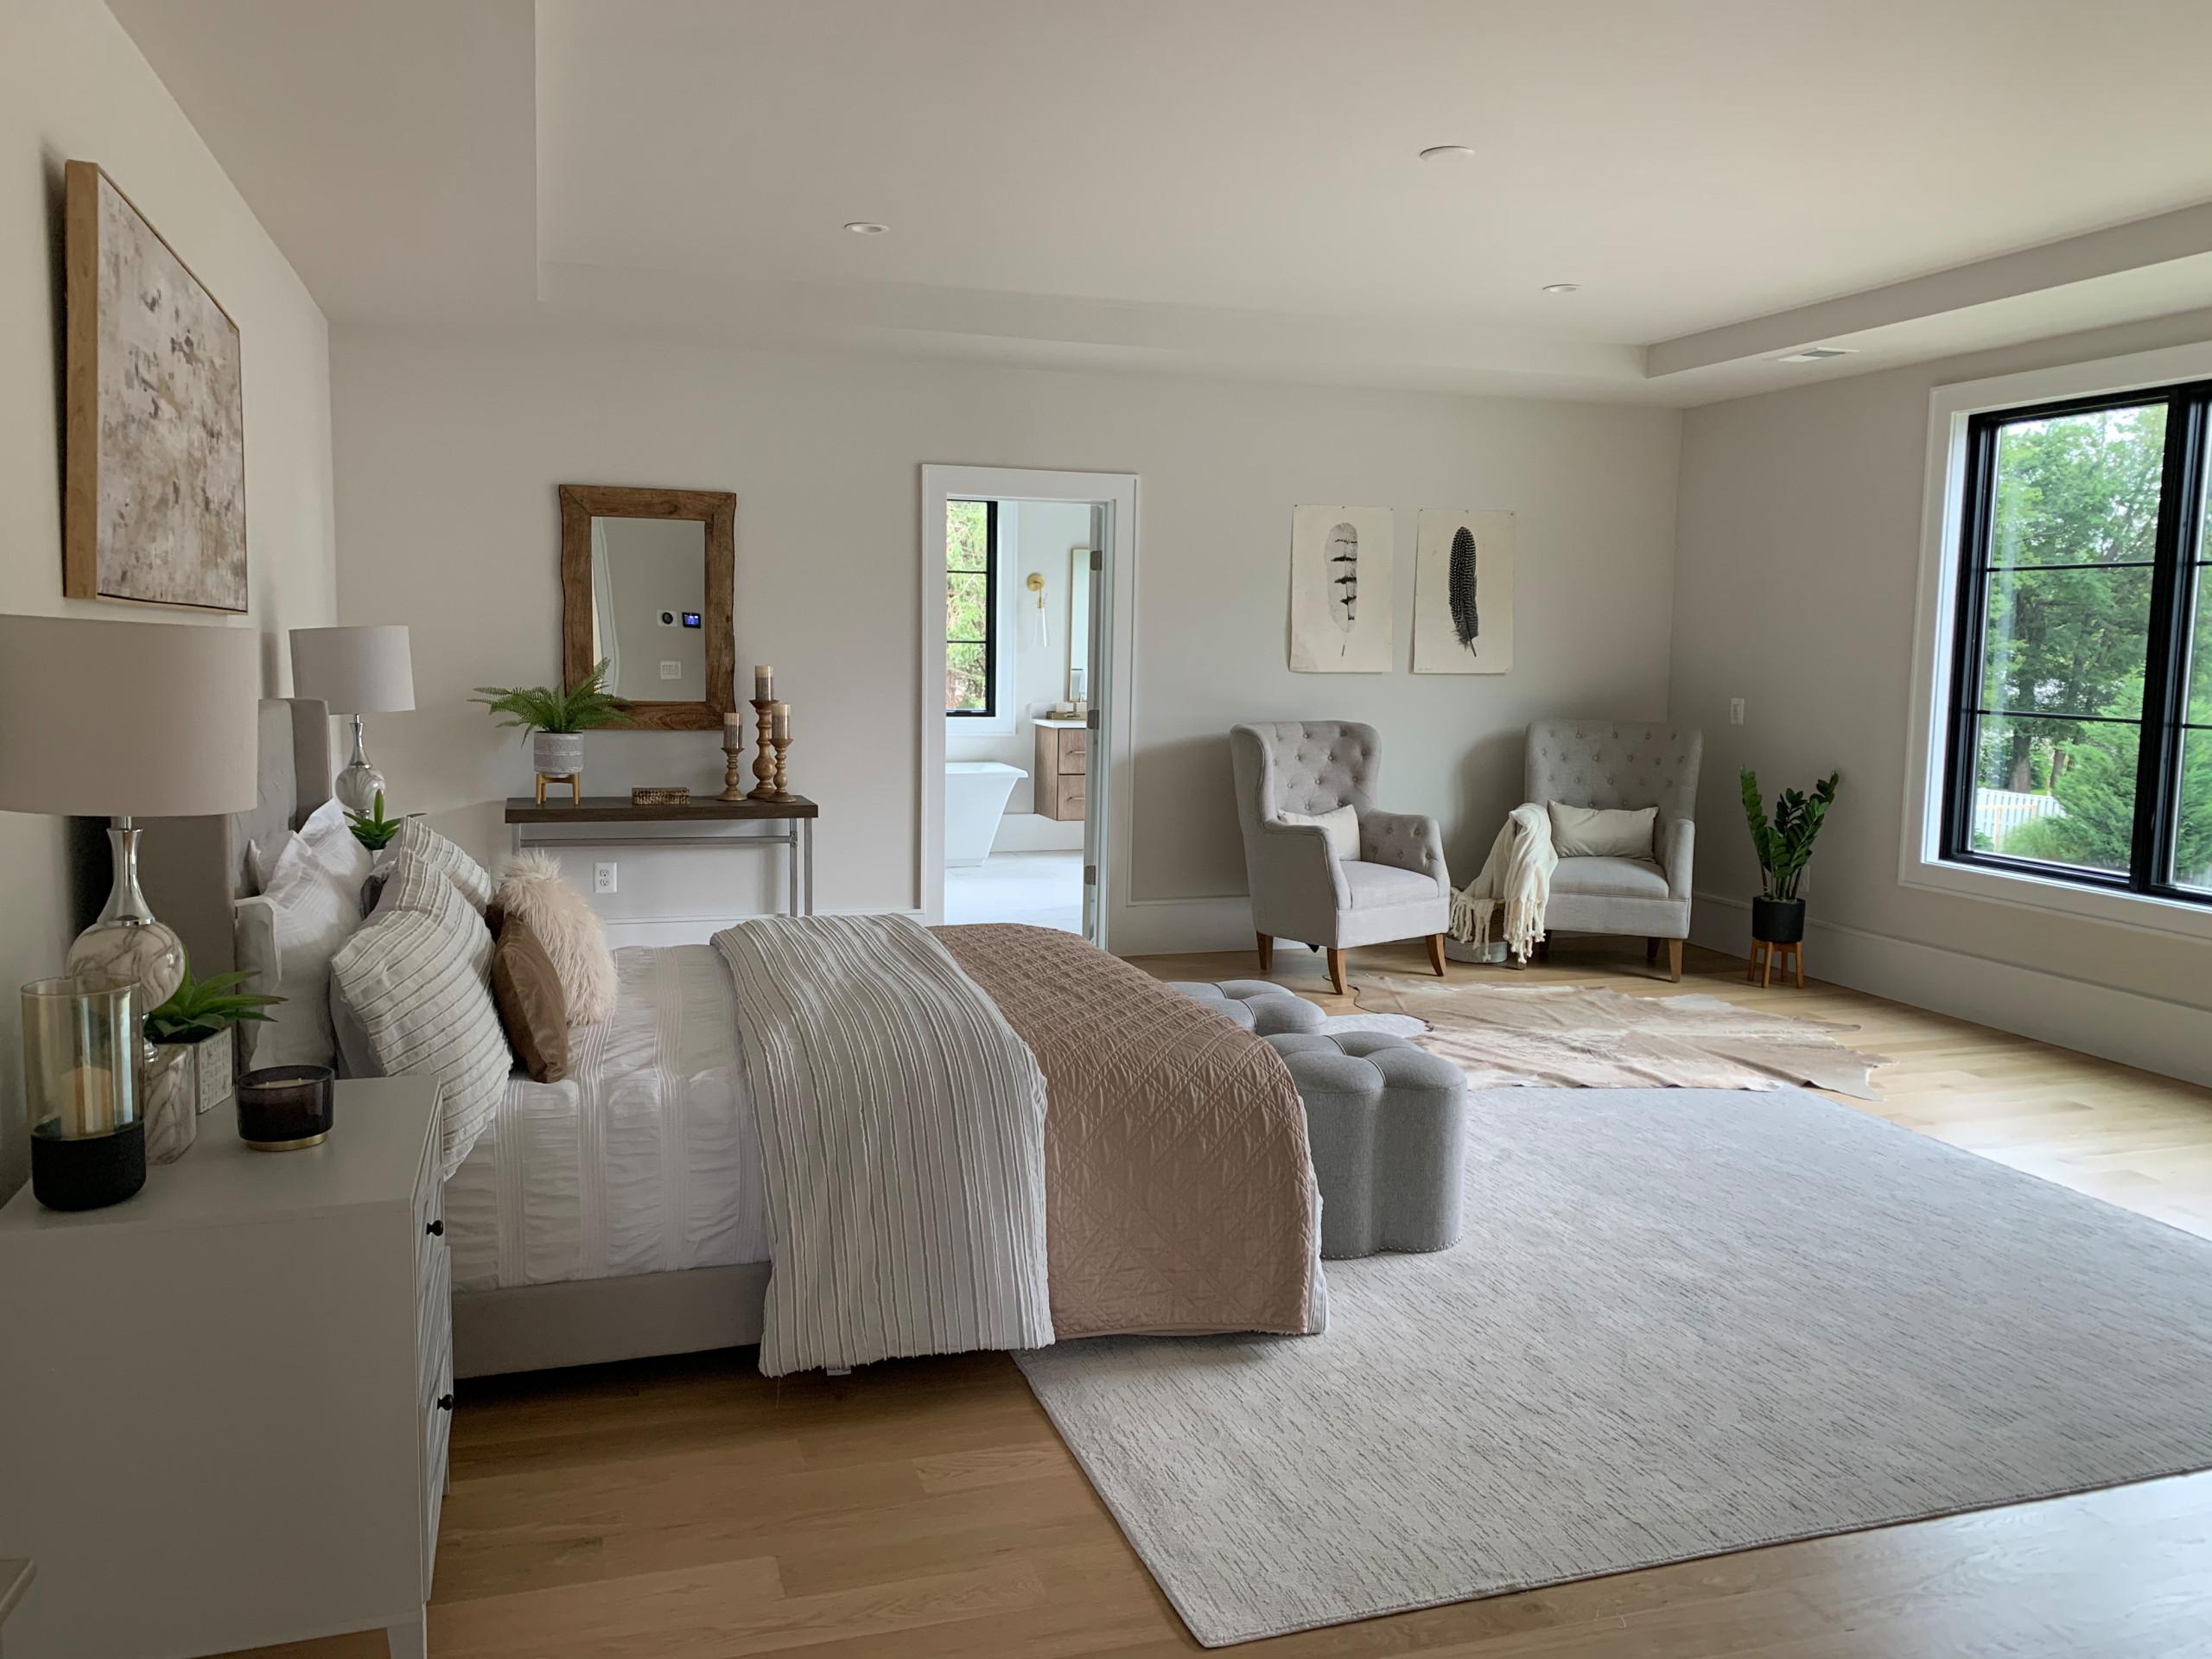 New Construction Bedroom